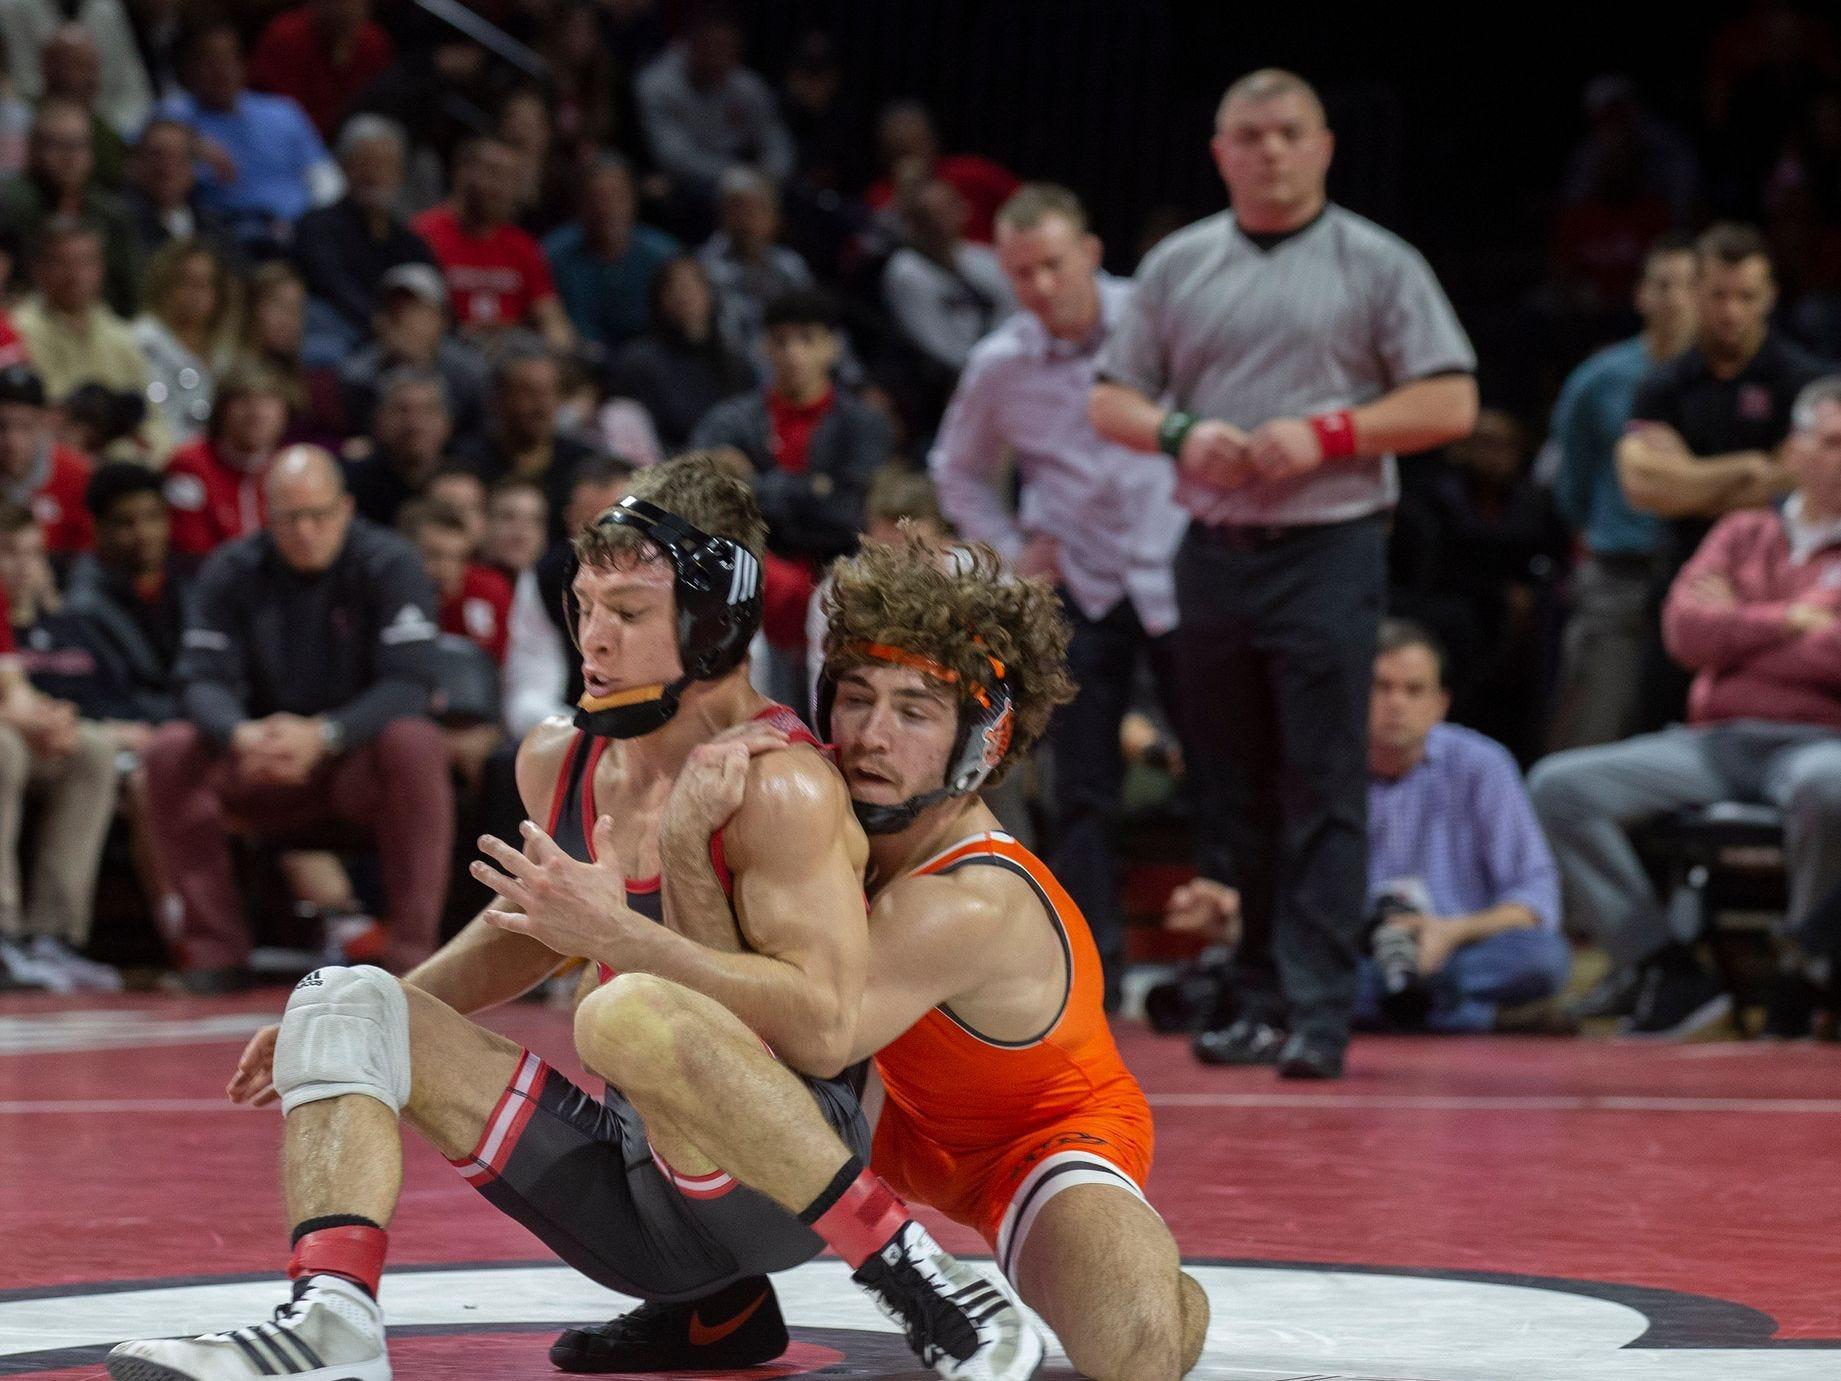 College wrestling: Nick Suriano suffers second straight loss